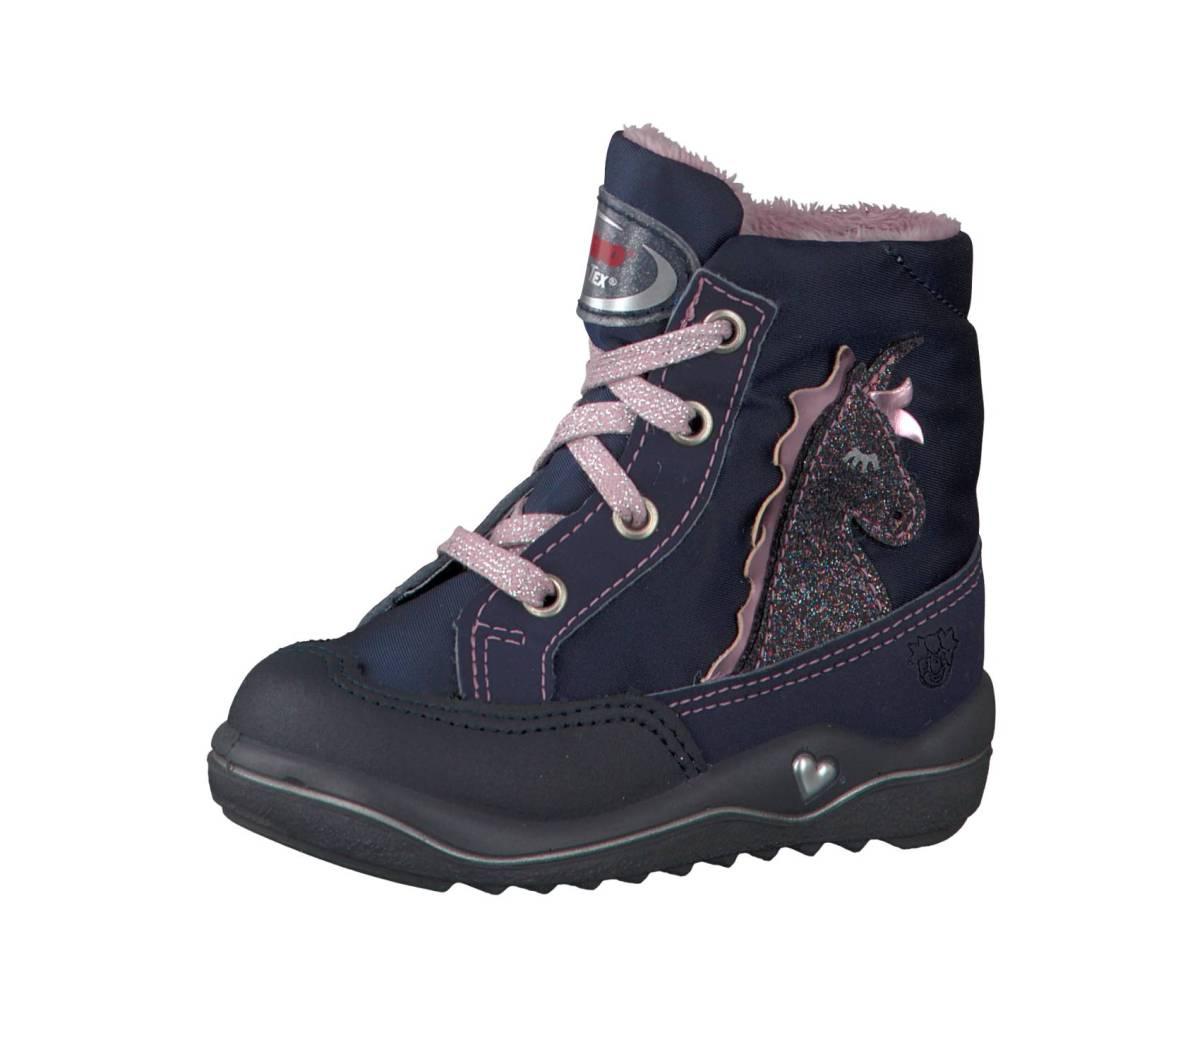 Ricosta Pepino Alina blau (Rakete) nautic marine Stiefel Boots Jungen Mädchen